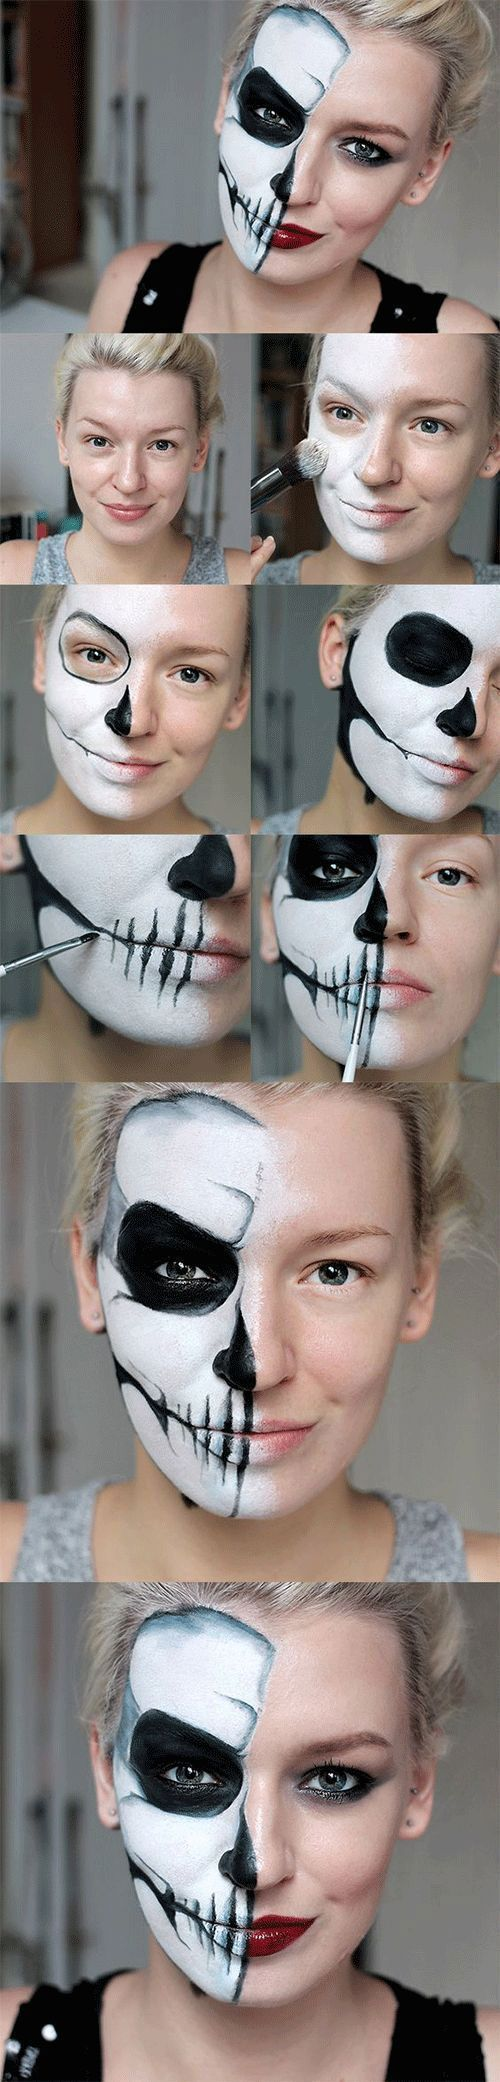 Einfaches hausdesign 2018  best halloween images on pinterest  artistic make up halloween